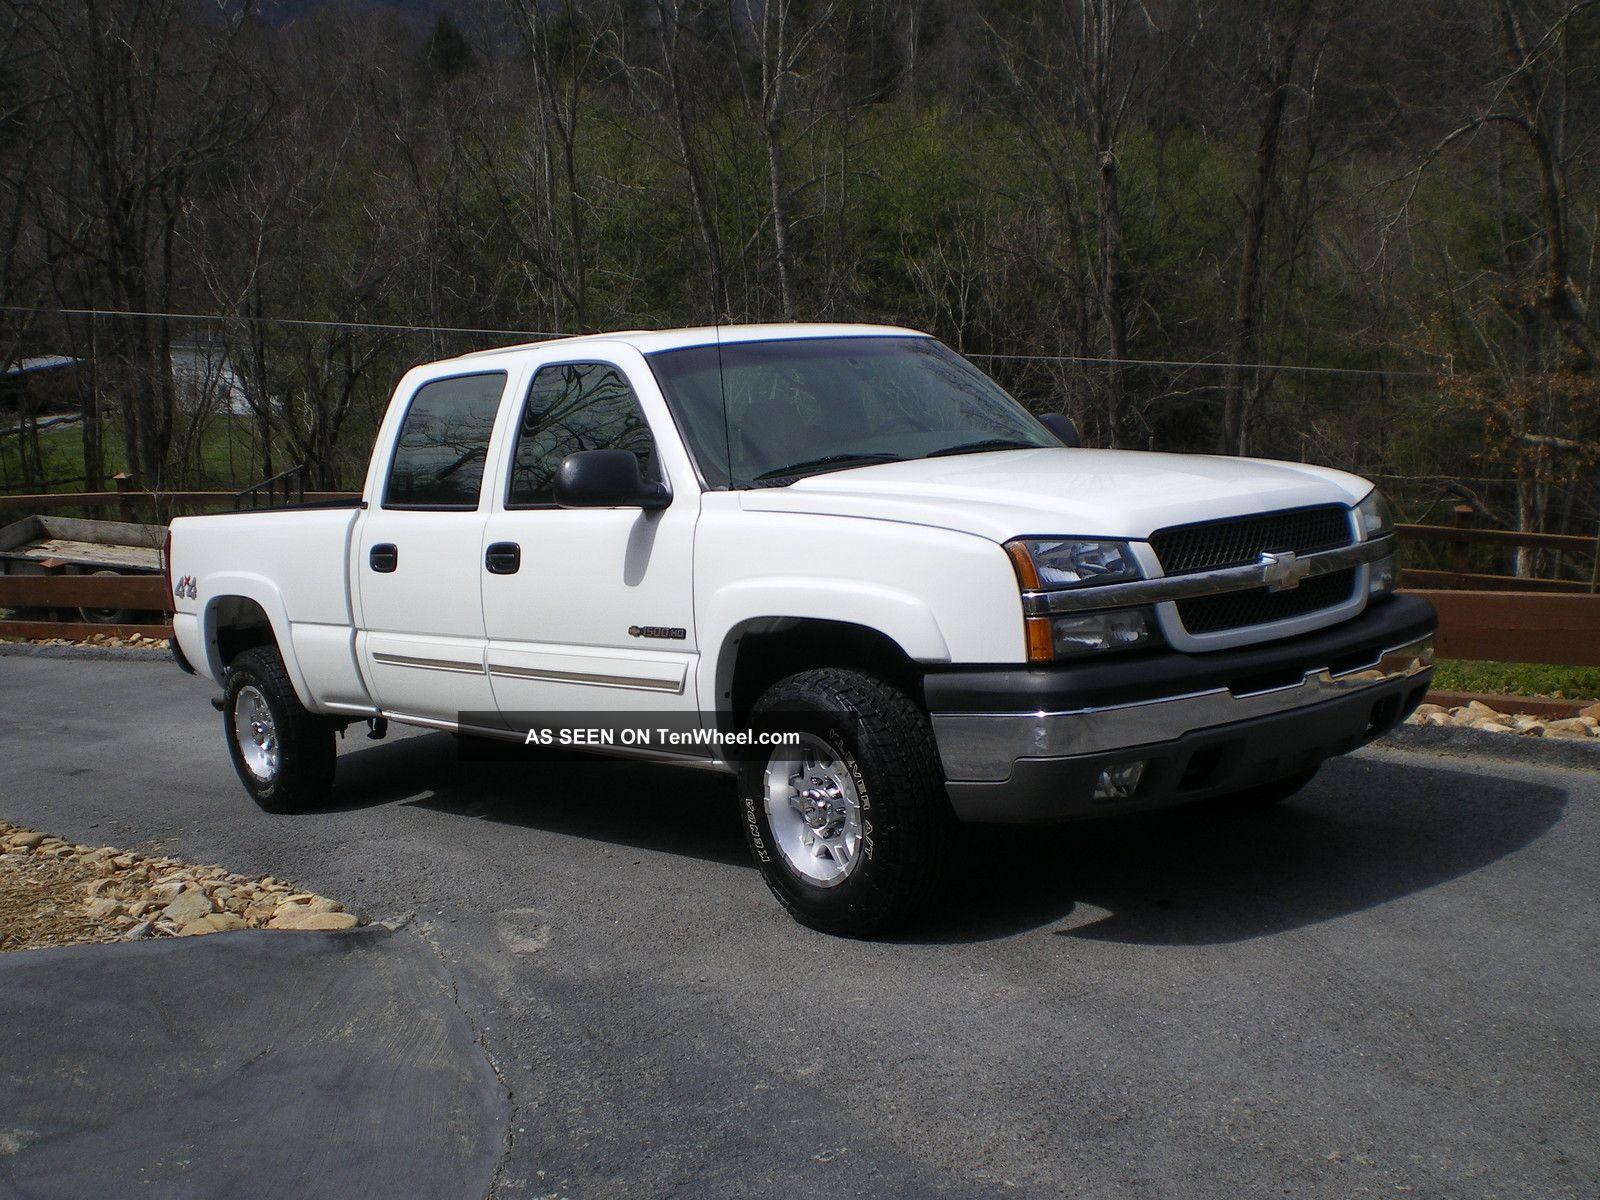 2003 chevrolet silverado 1500 hd ls crew cab pickup 4 door 6 0l 4x4